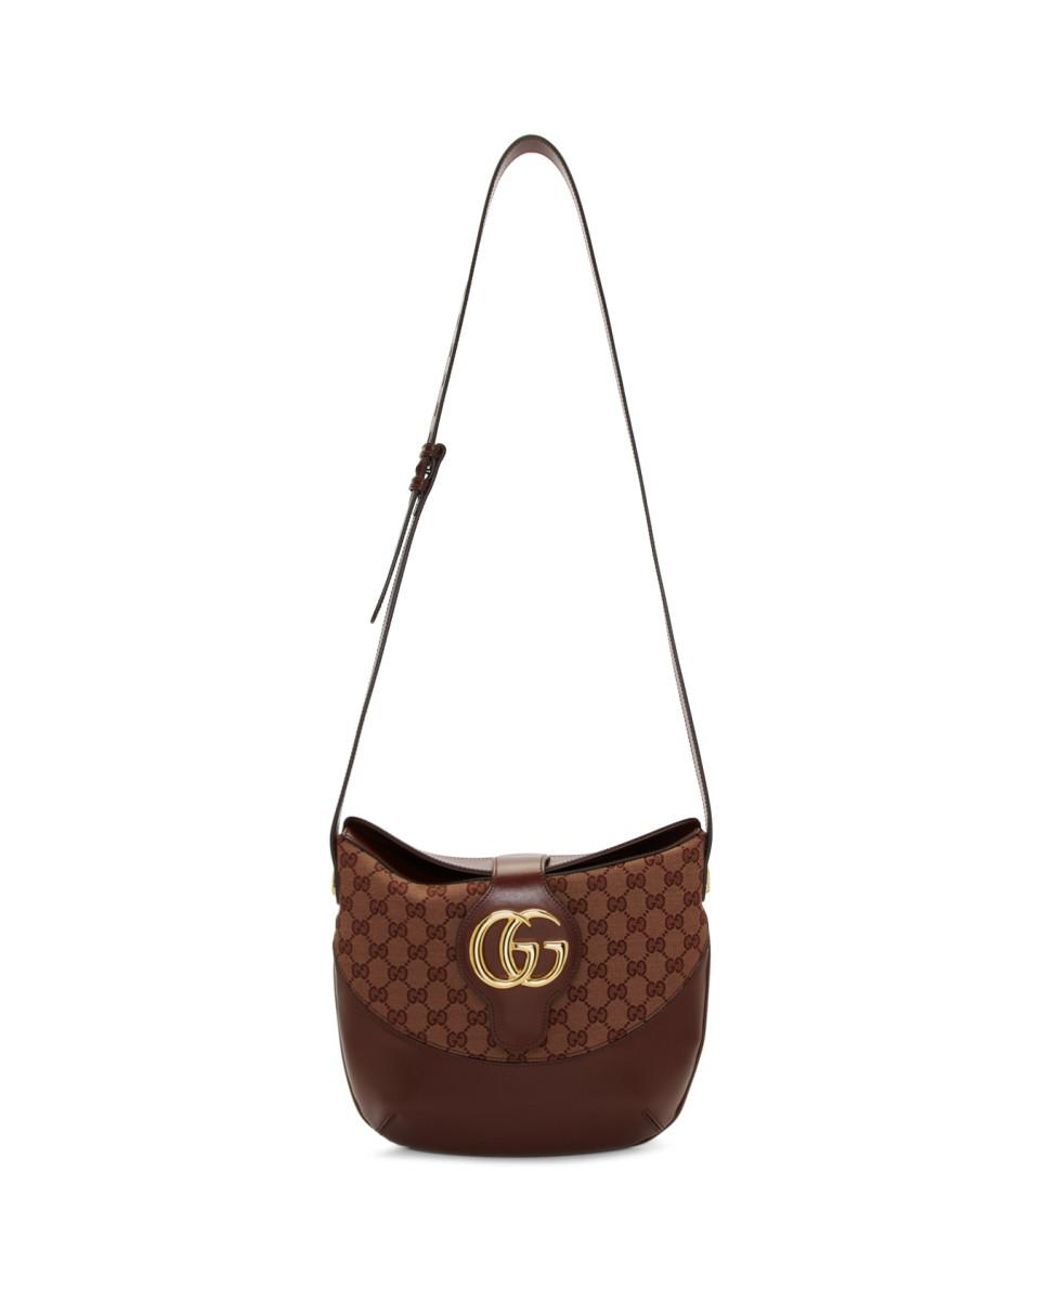 384d64a1142 Gucci Burgundy Medium GG Arli Bag in Brown - Lyst